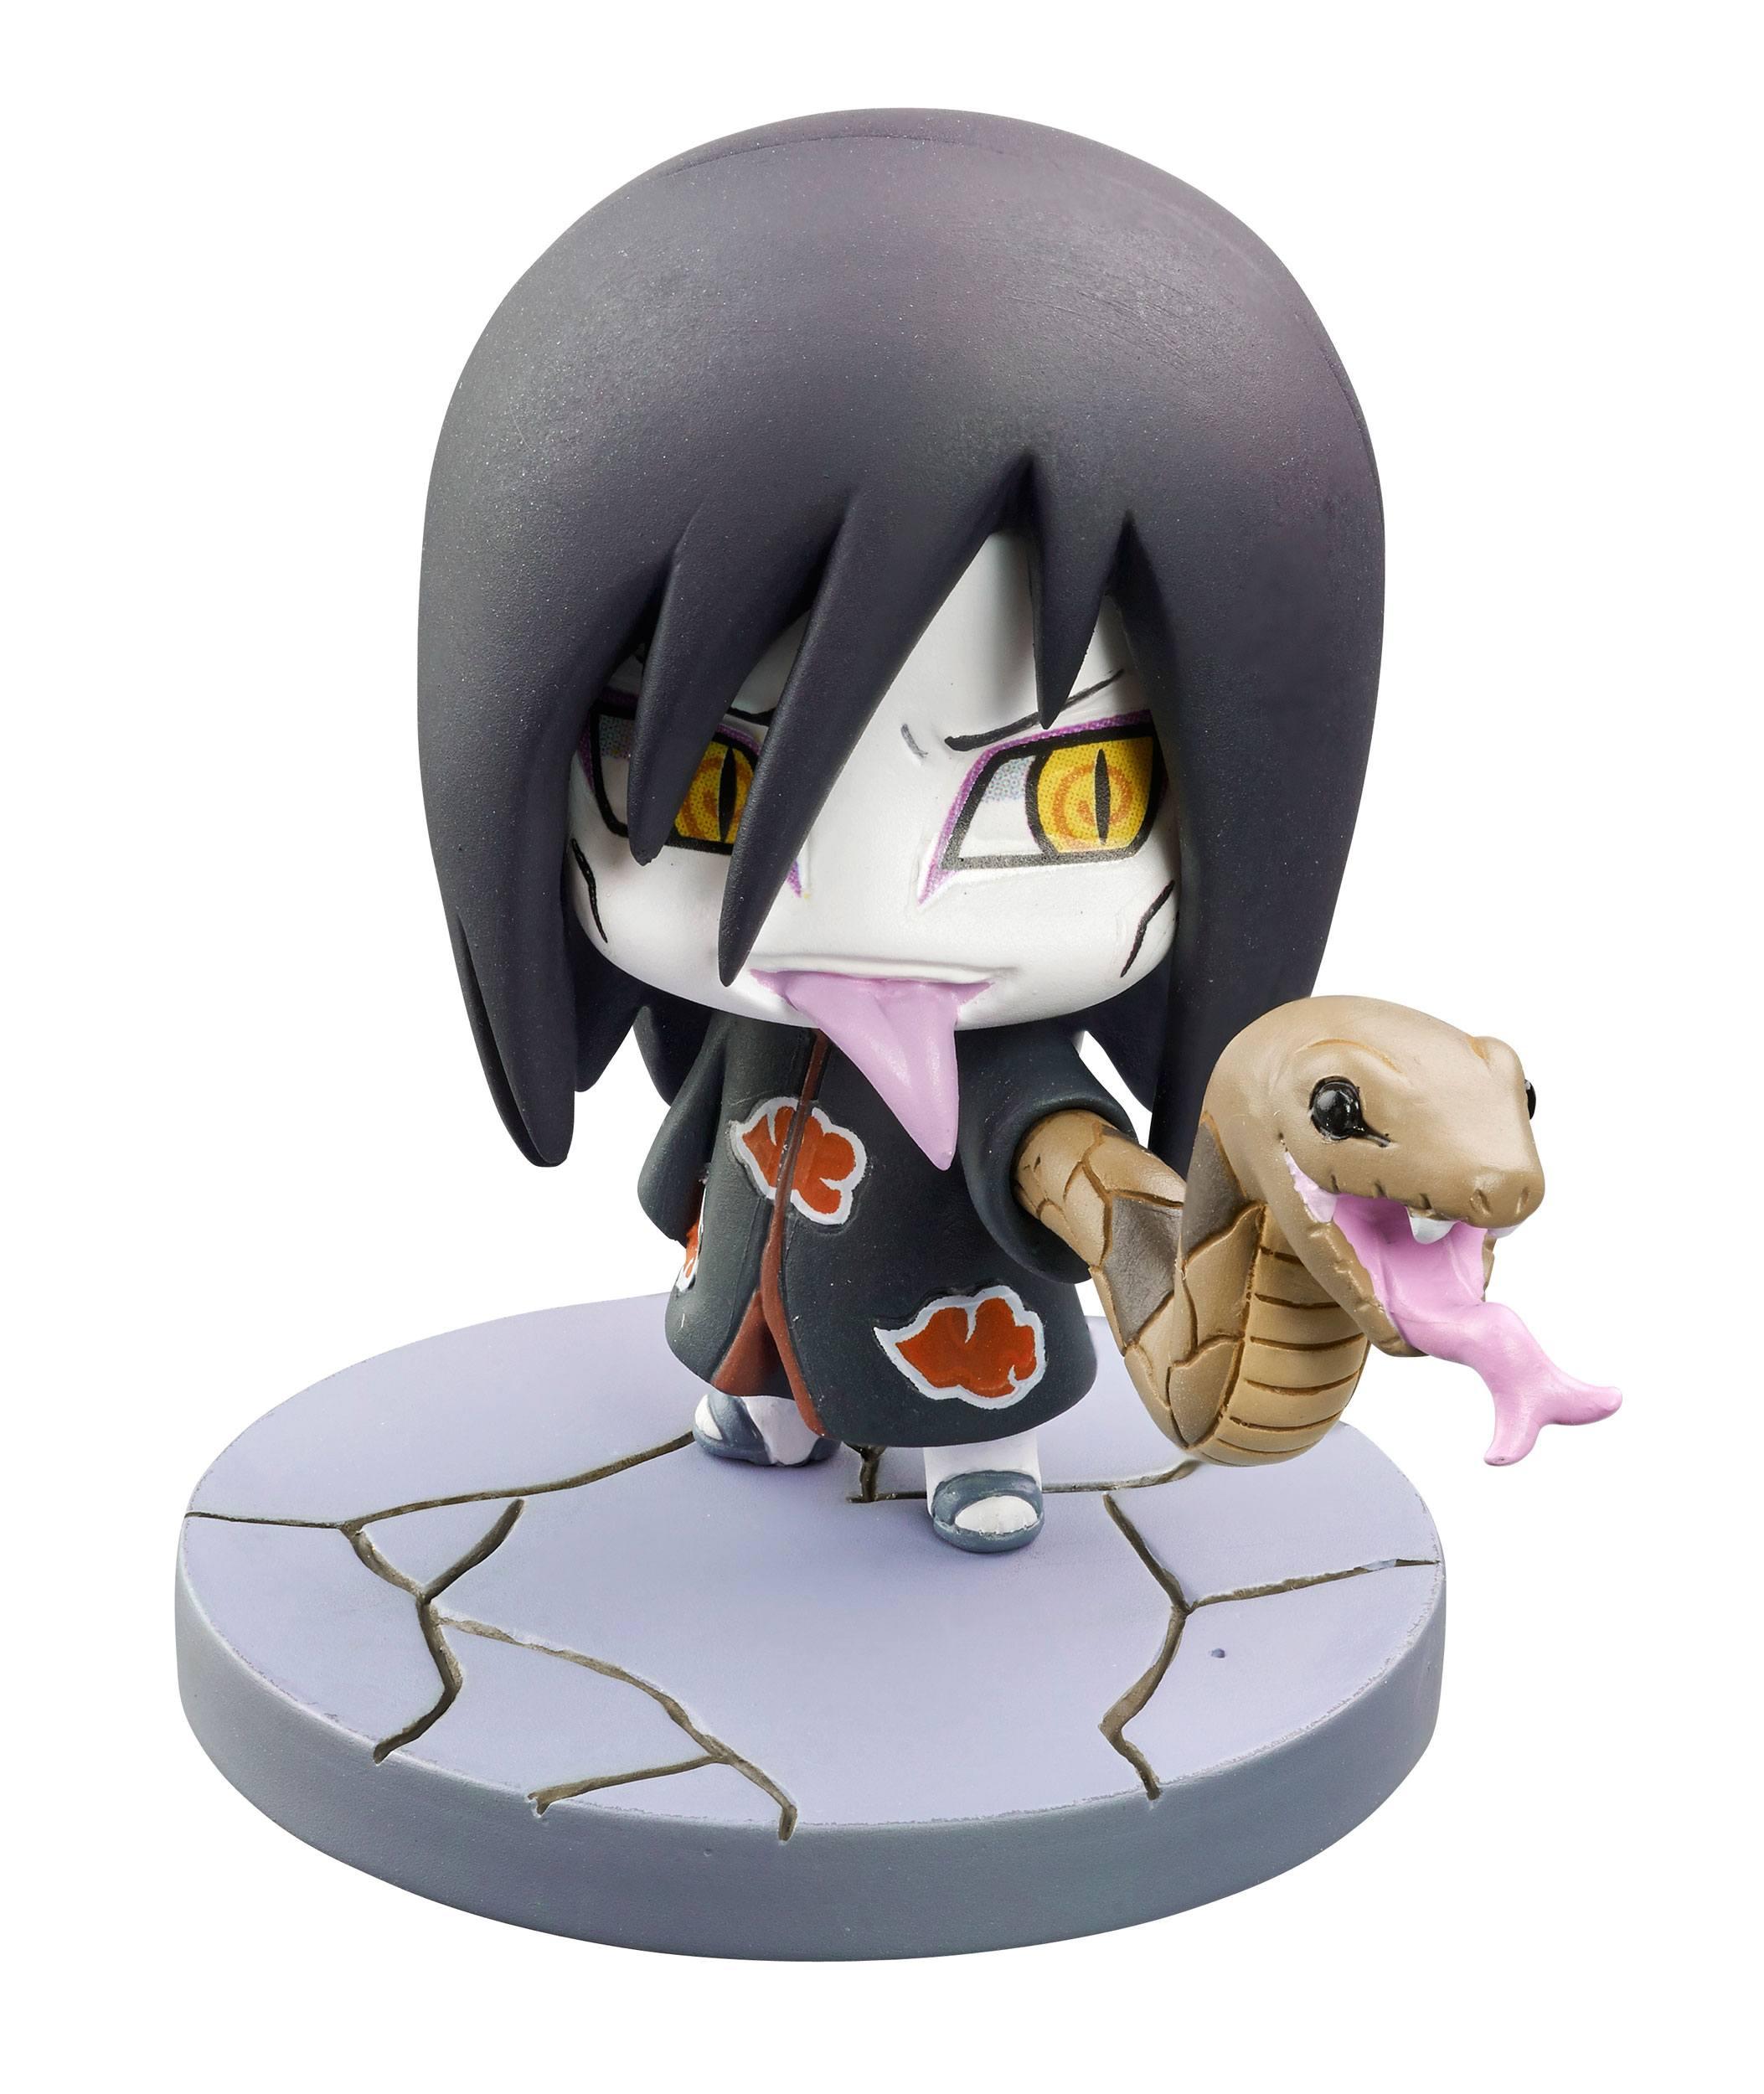 Naruto Shippuden Petit Chara Land Trading Figure 6 cm Naruto & Akatsuki  Part 2 Assortment (6) - Animegami Store